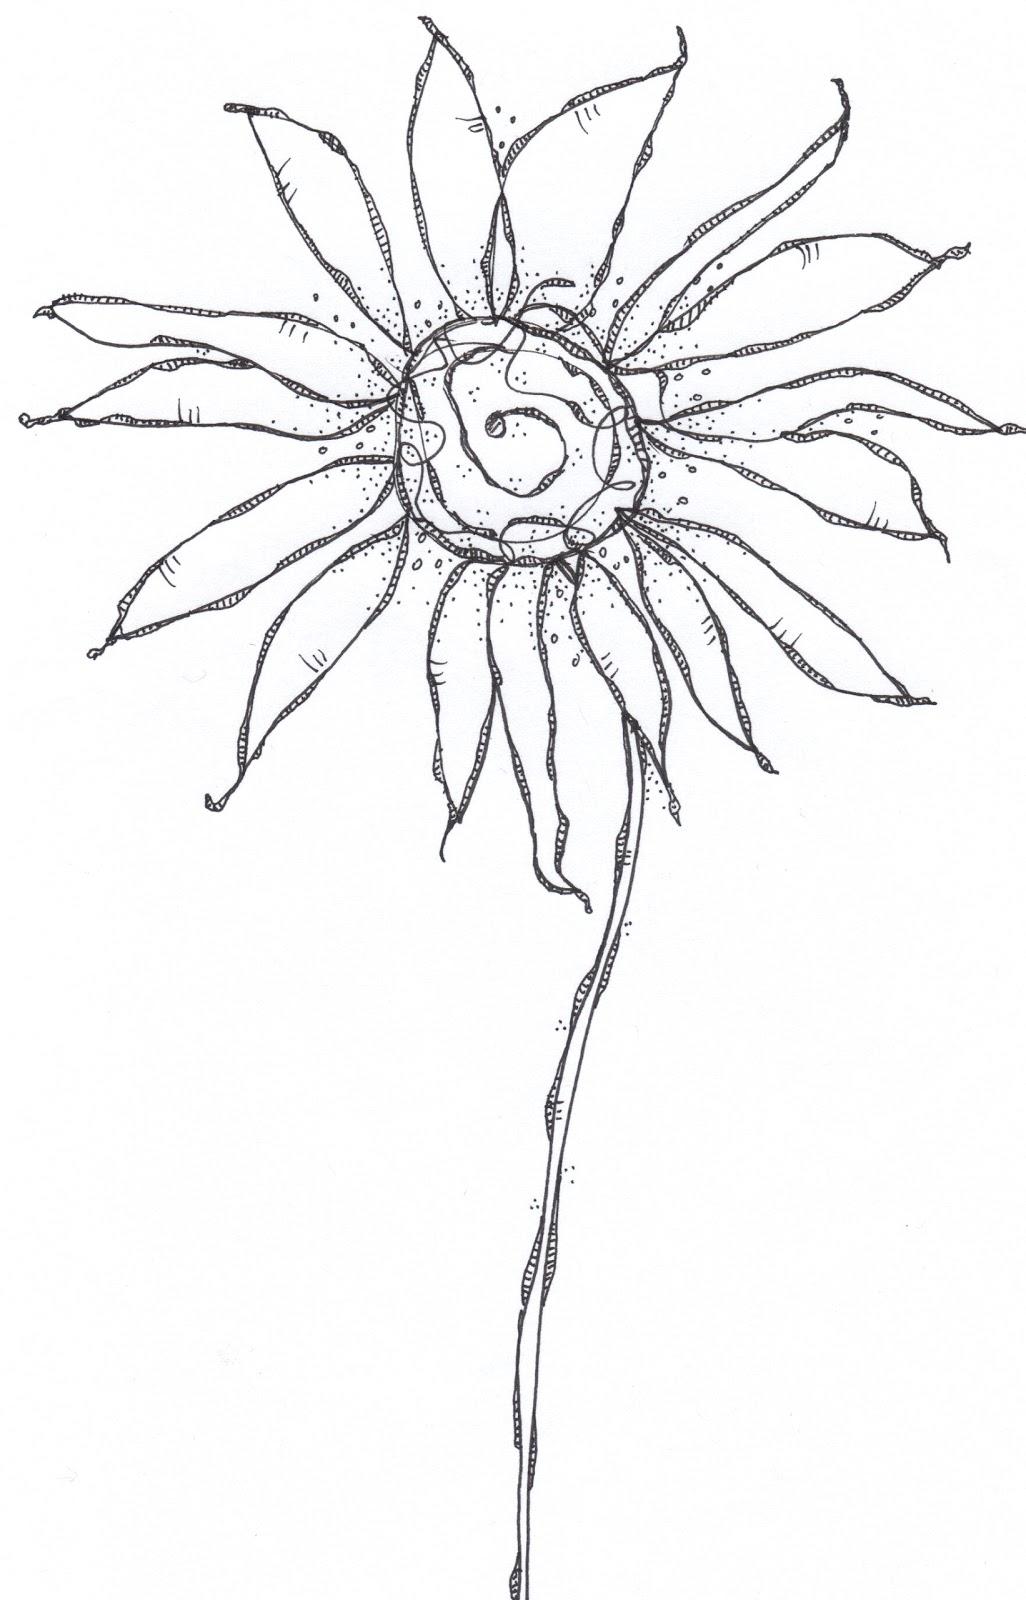 Flower Line Drawing Book : The sketchbook challenge unleashing doodle beast